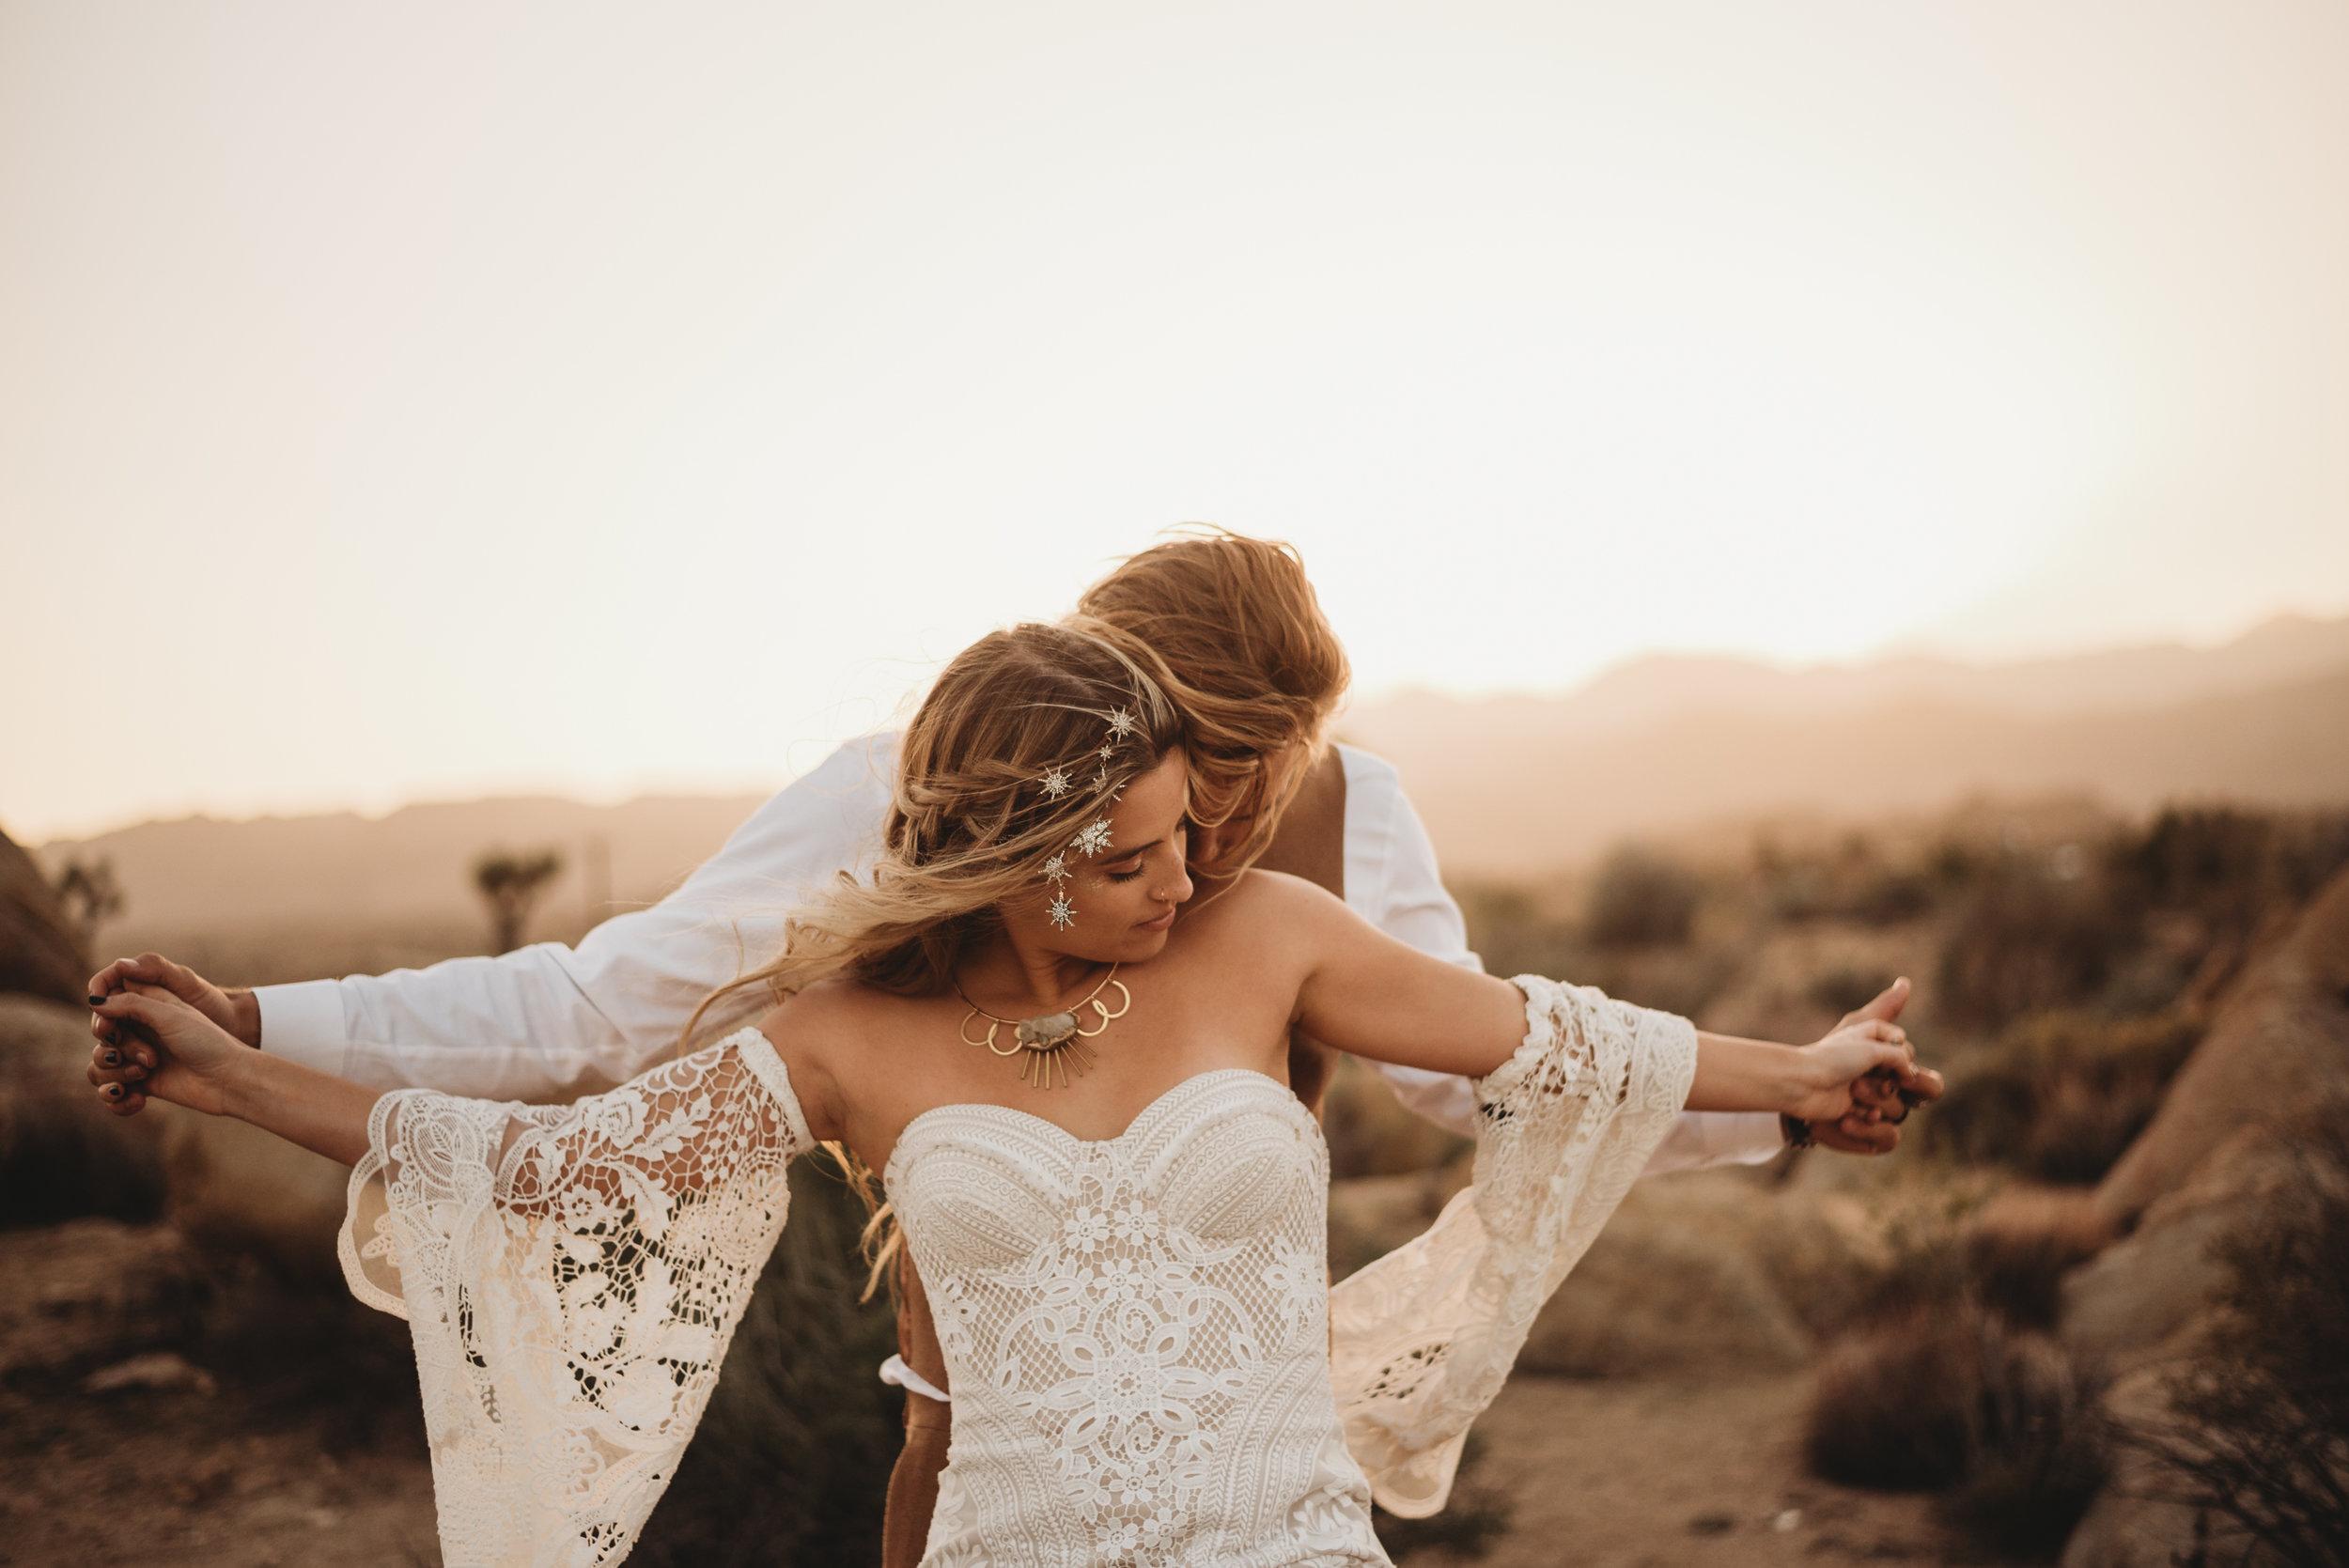 FortSt.John_photographer_TyraEPhotography_Wedding_Couple_Family_Photograhy_DawsonCreek_Elopement_Bride_Boduoir_Portraits-8631.jpg